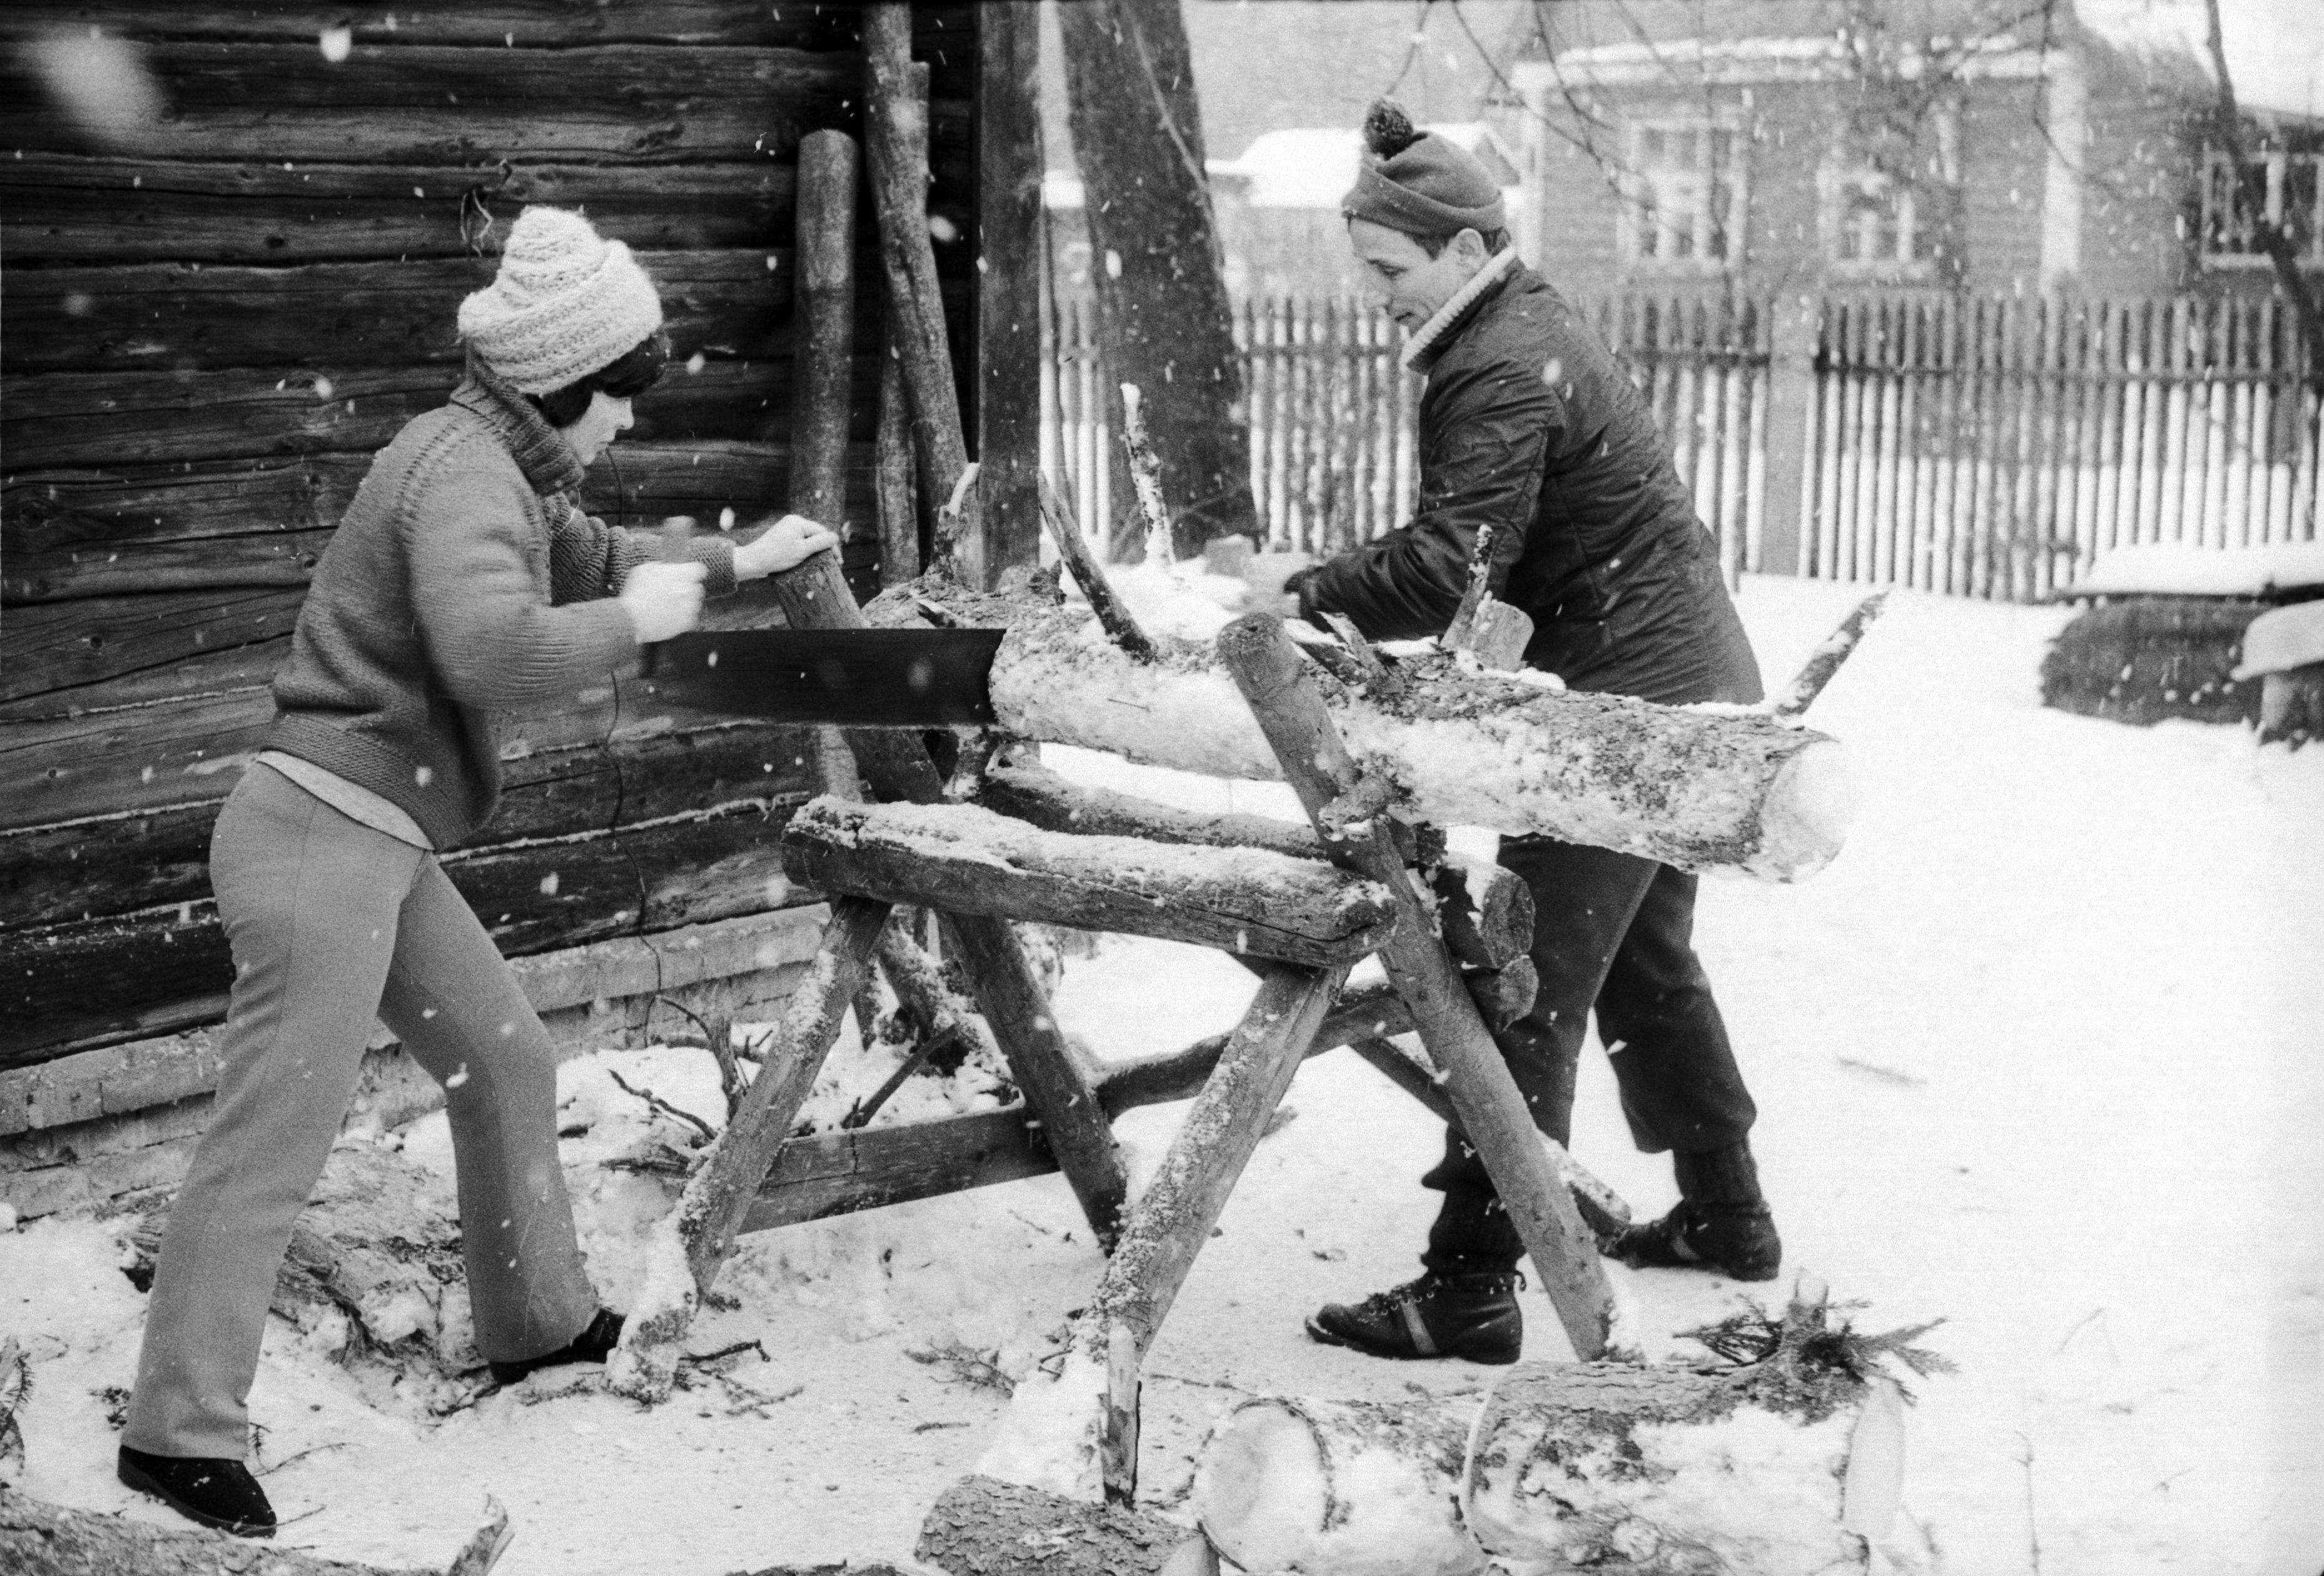 IX-1-1984-Zagotovka-drov-v-pansionate